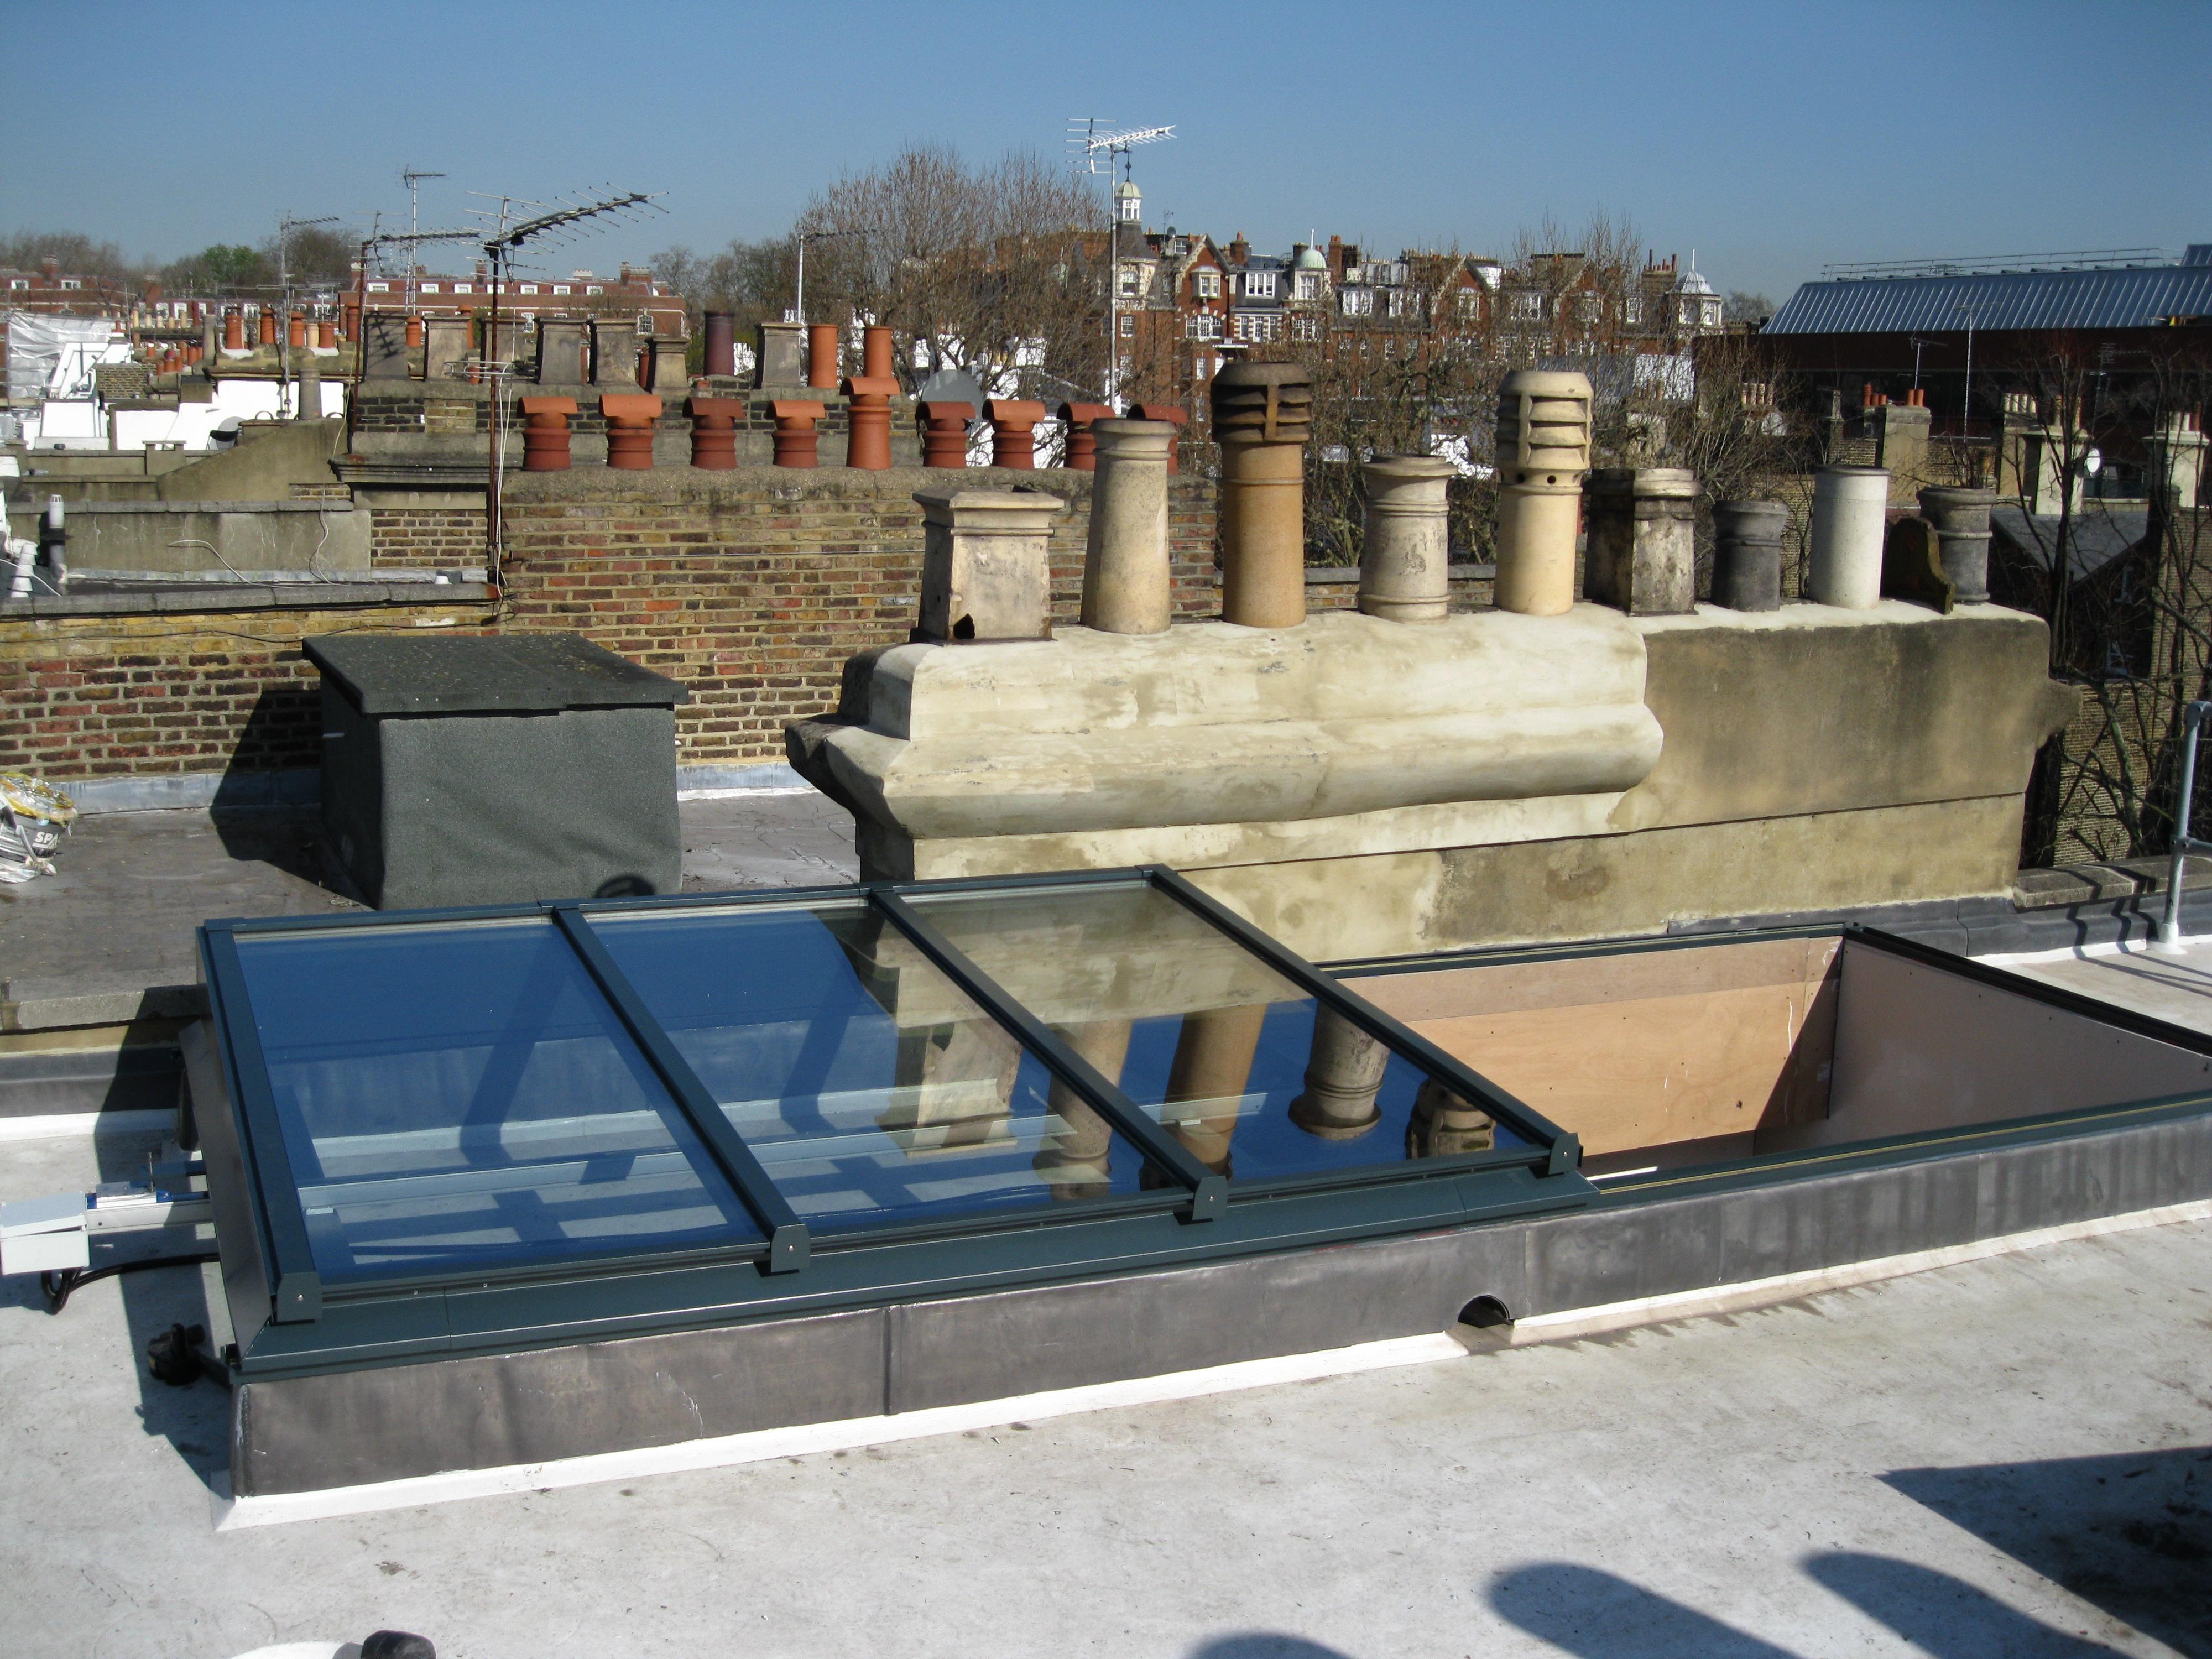 ARGL - Fully Retracting, Slide Open Glazed Roof, Roof  Rooflight, Sky;ight